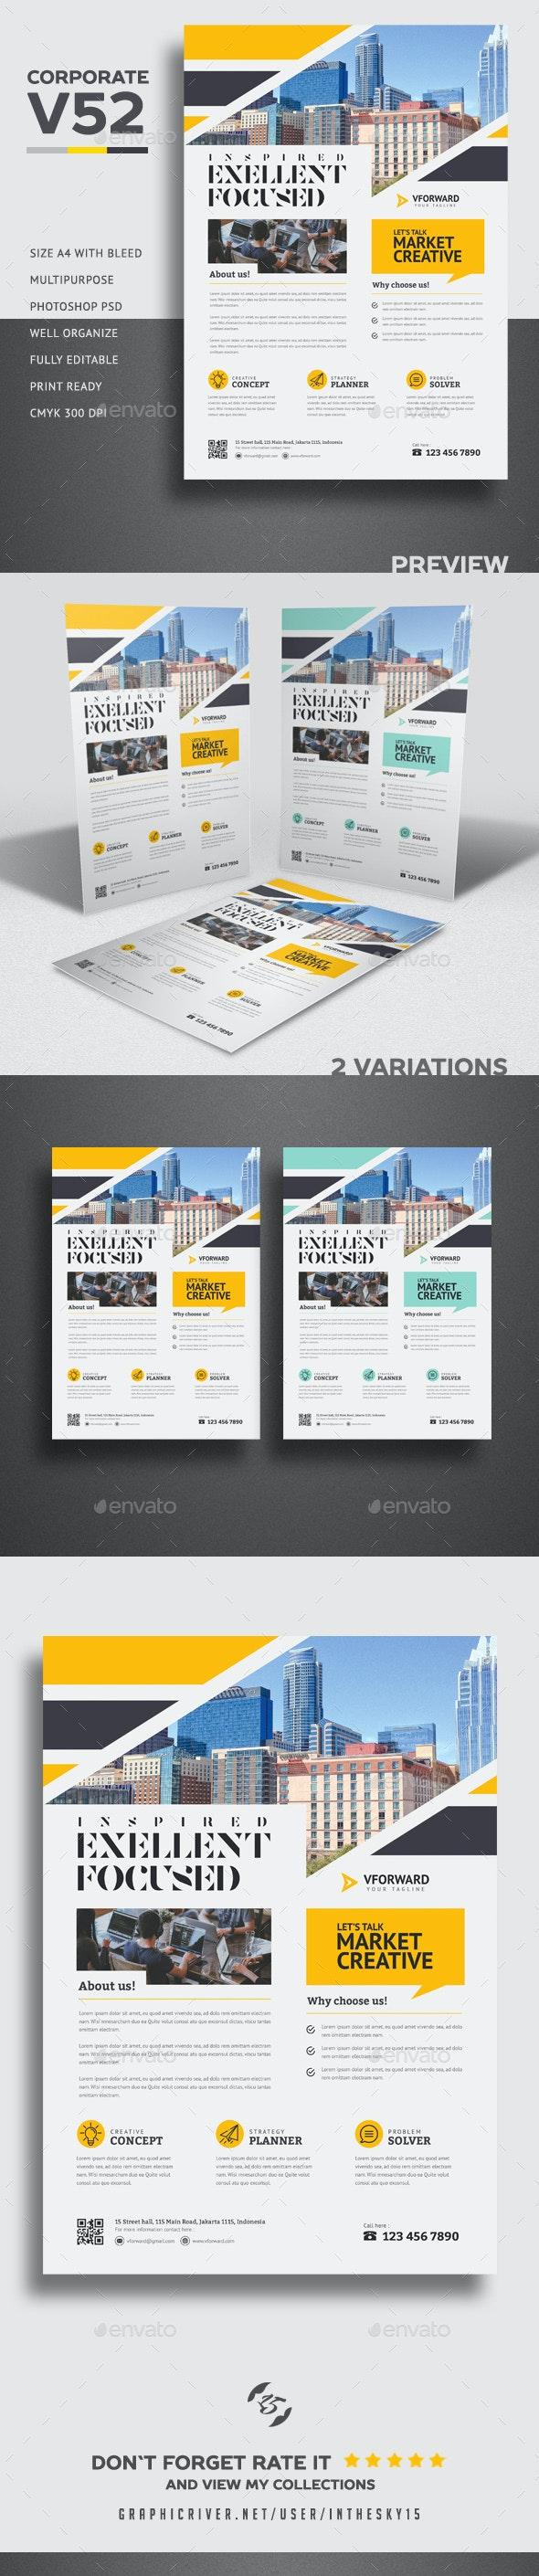 Corporate V52 Flyer - Corporate Brochures